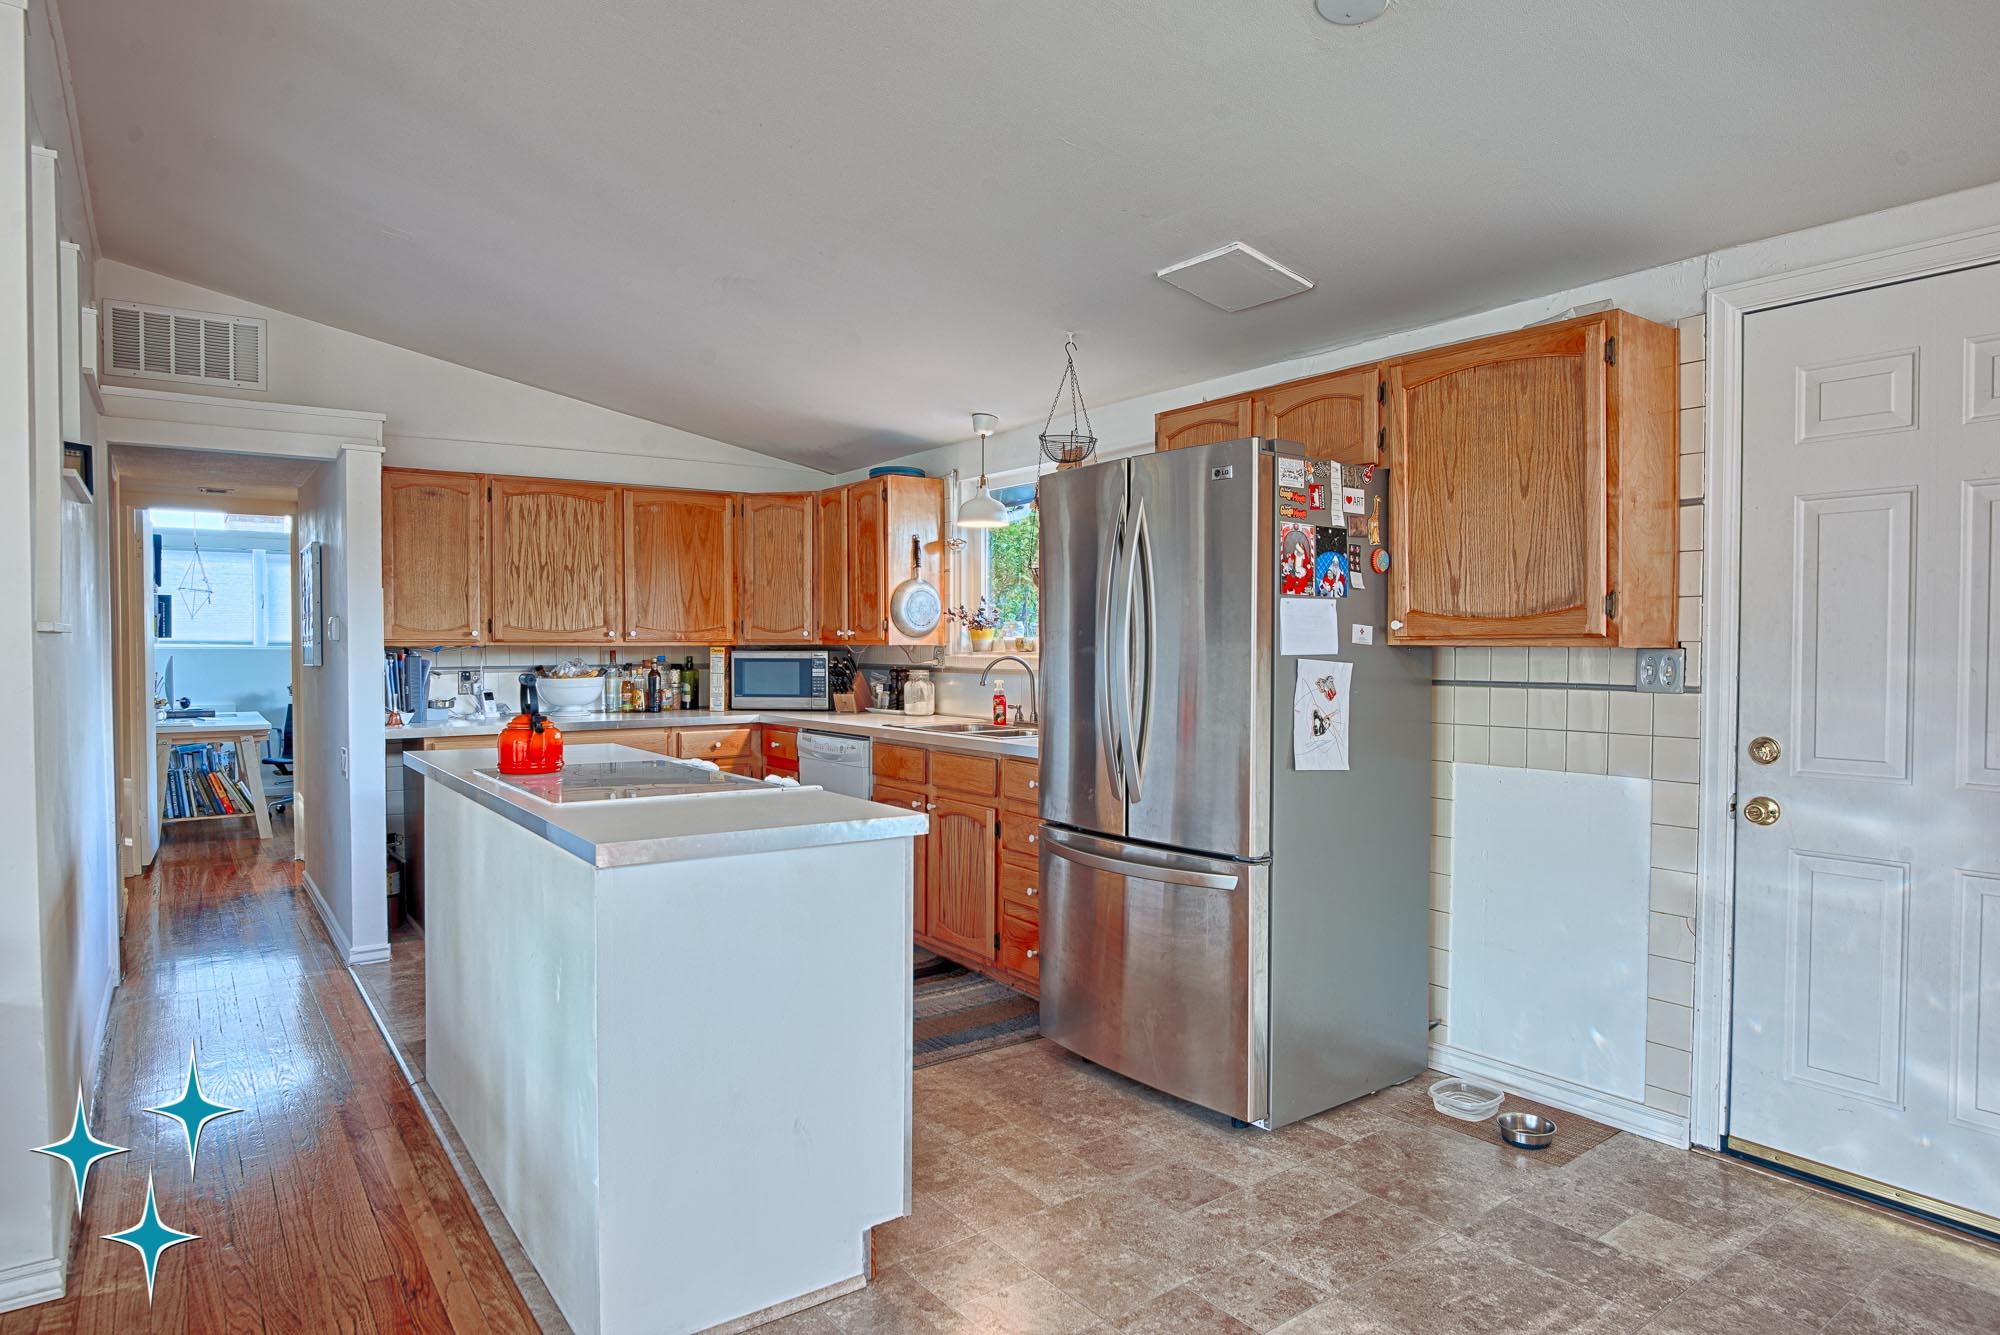 Adrian-Kinney-2596-S-Osceola-Street-Denver-Cliff-May-Harvey-Park-2000w50-3SWM-10.jpg